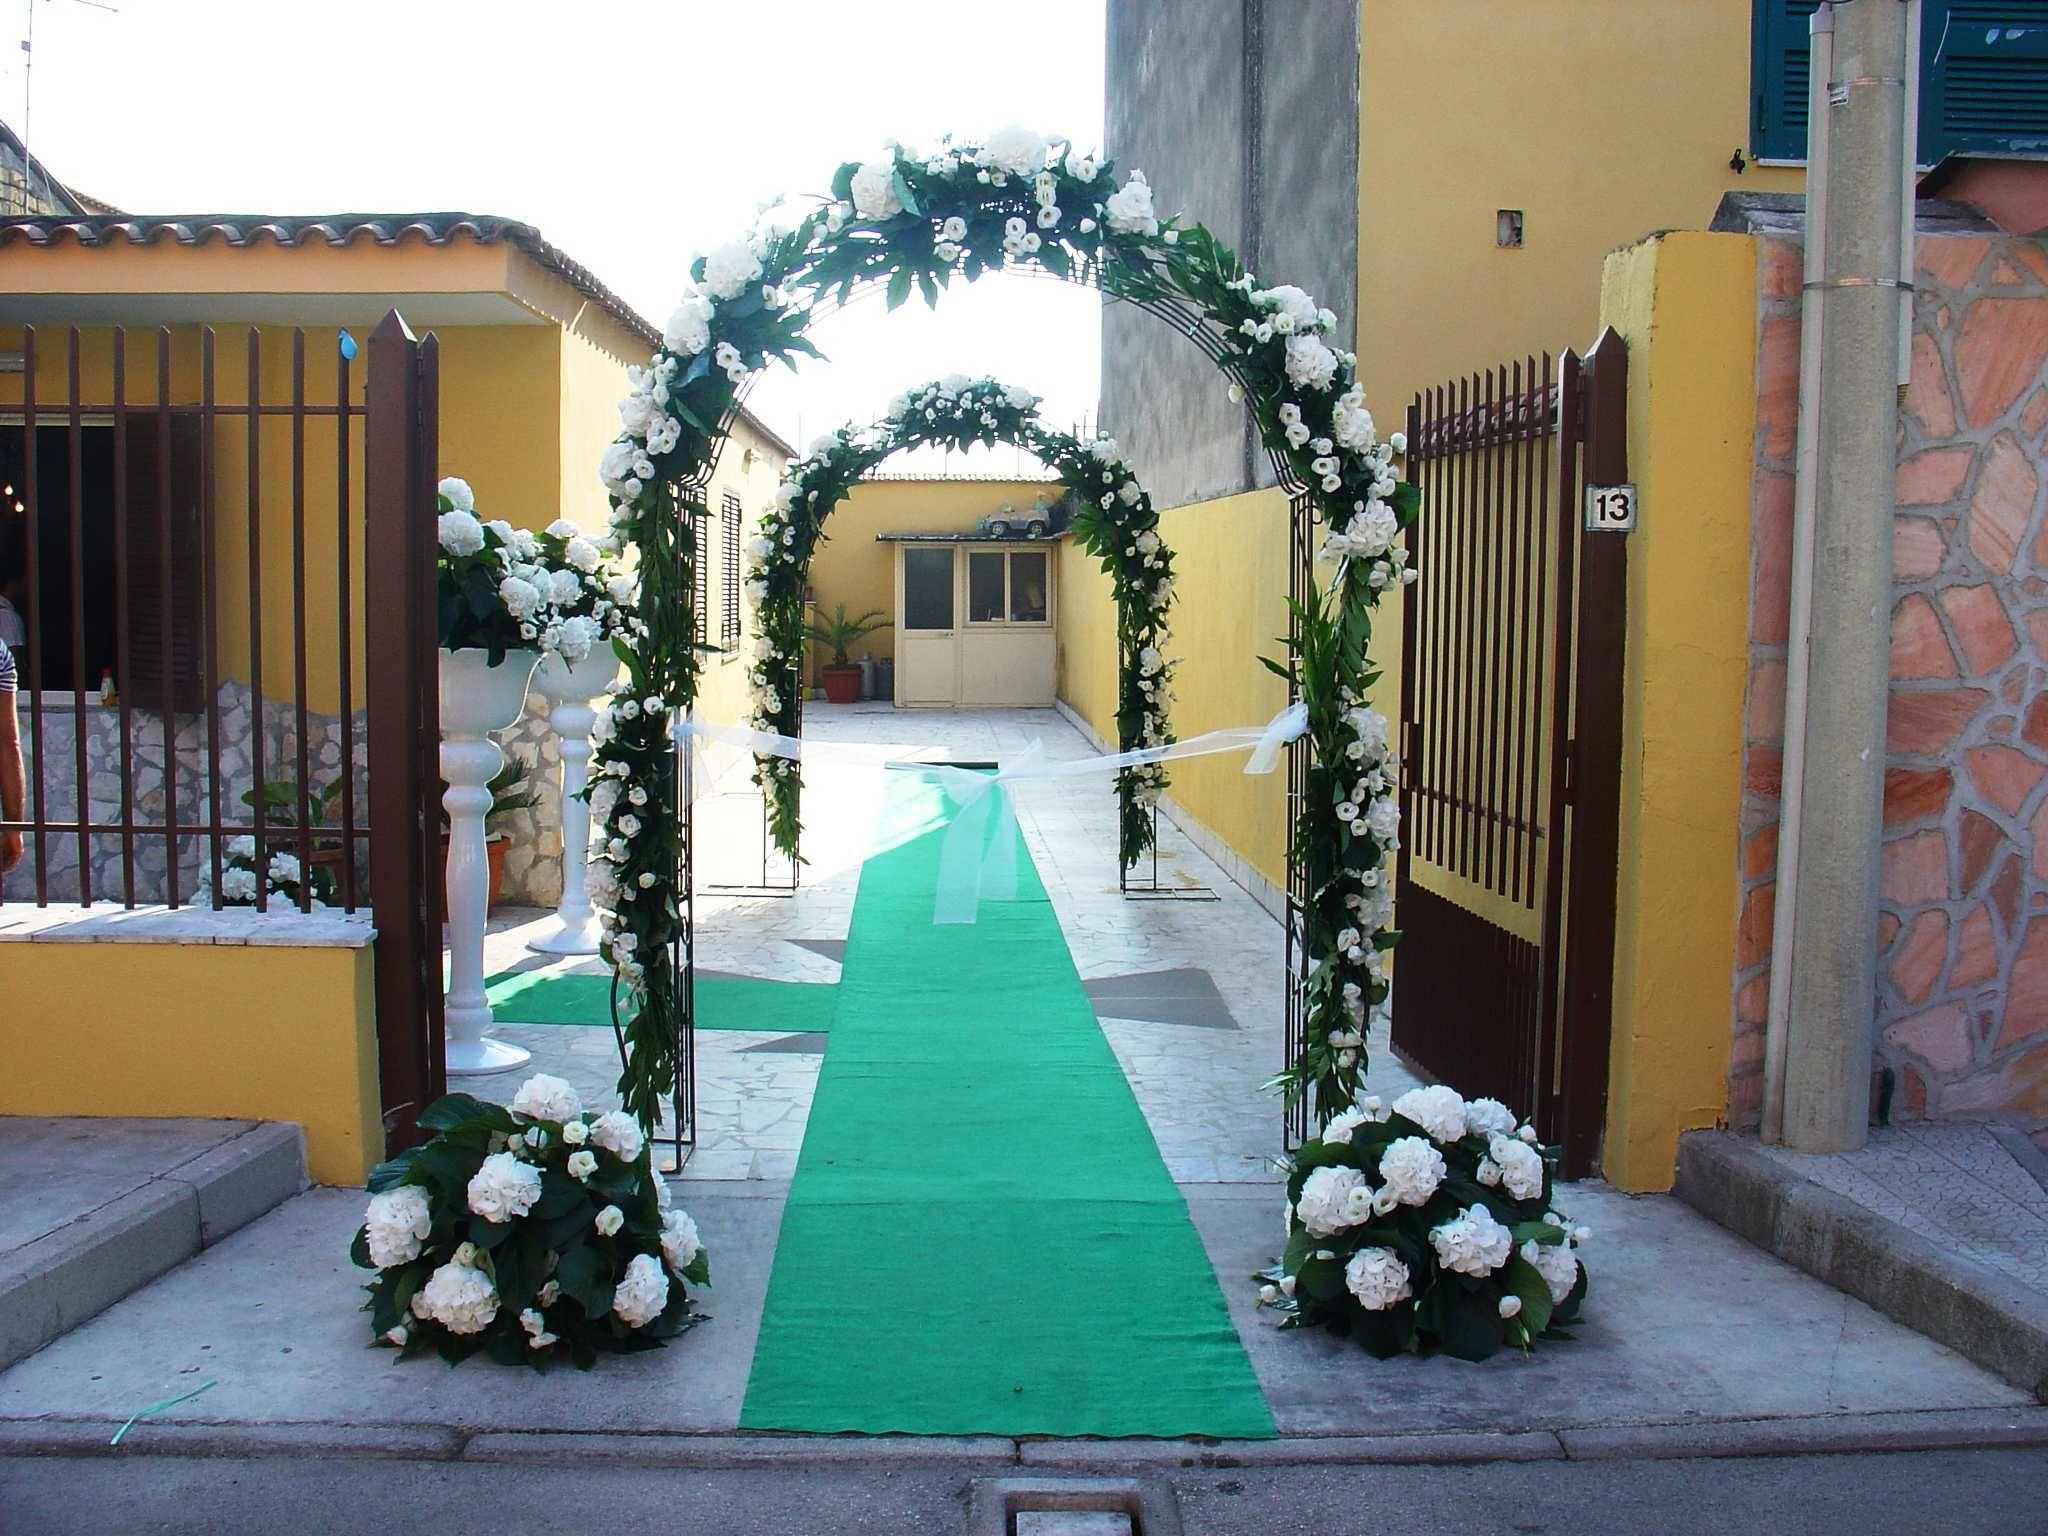 Souvent wedding #weddingplanner #matrimonio #matrimoniopartystyle #bride  TQ46